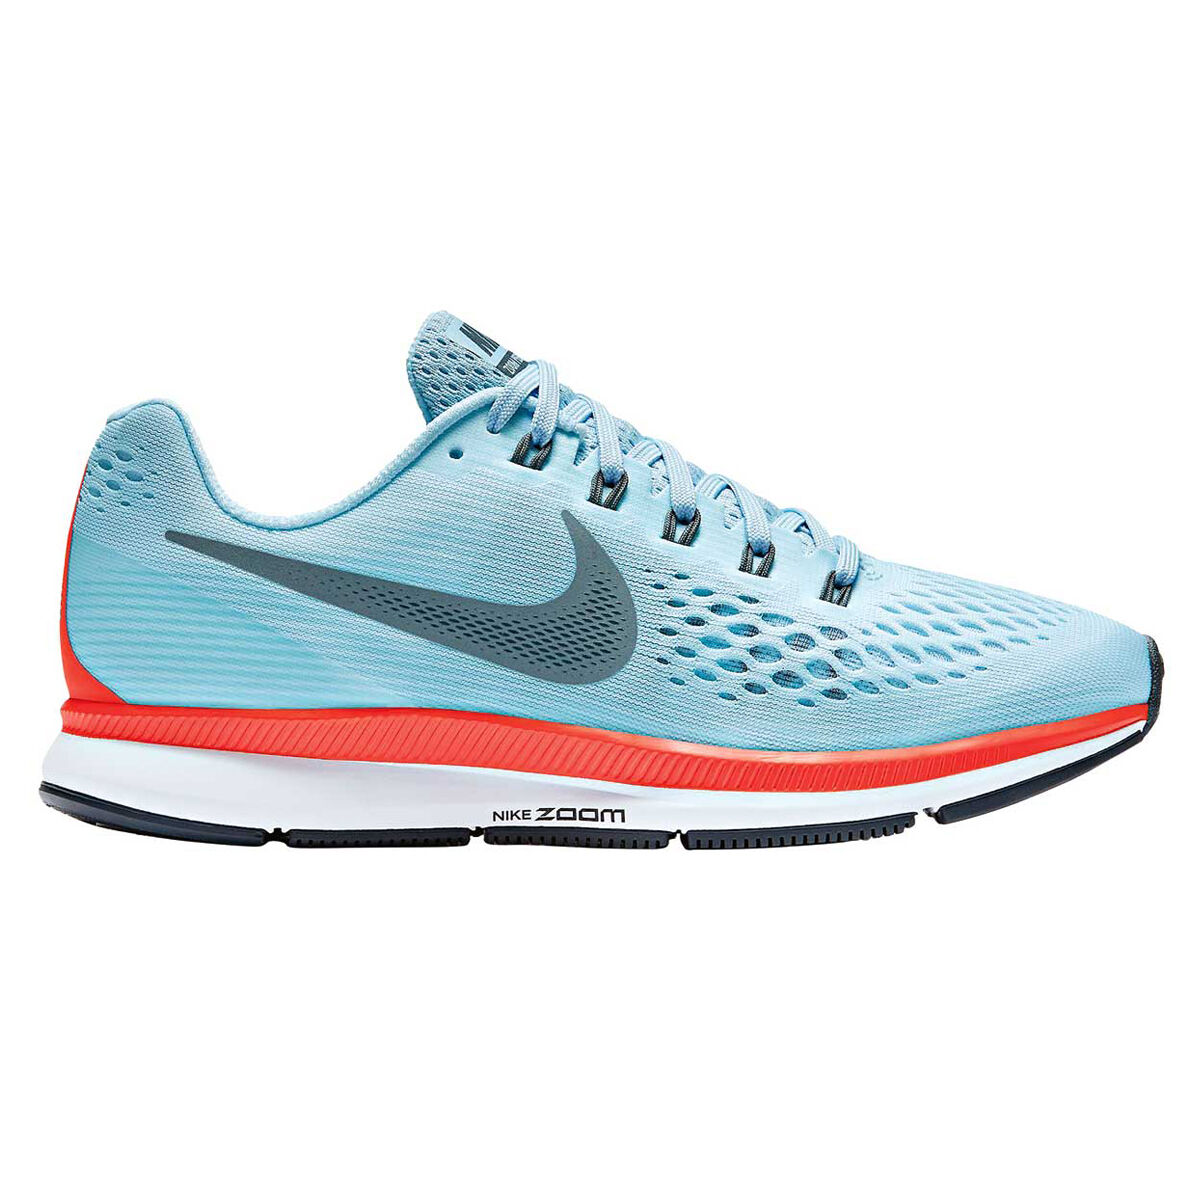 357f4c6dfc6c ... white 3dd7f 4e997 50% off nike air zoom pegasus 34 womens running shoes  blue orange us 6 blue ...